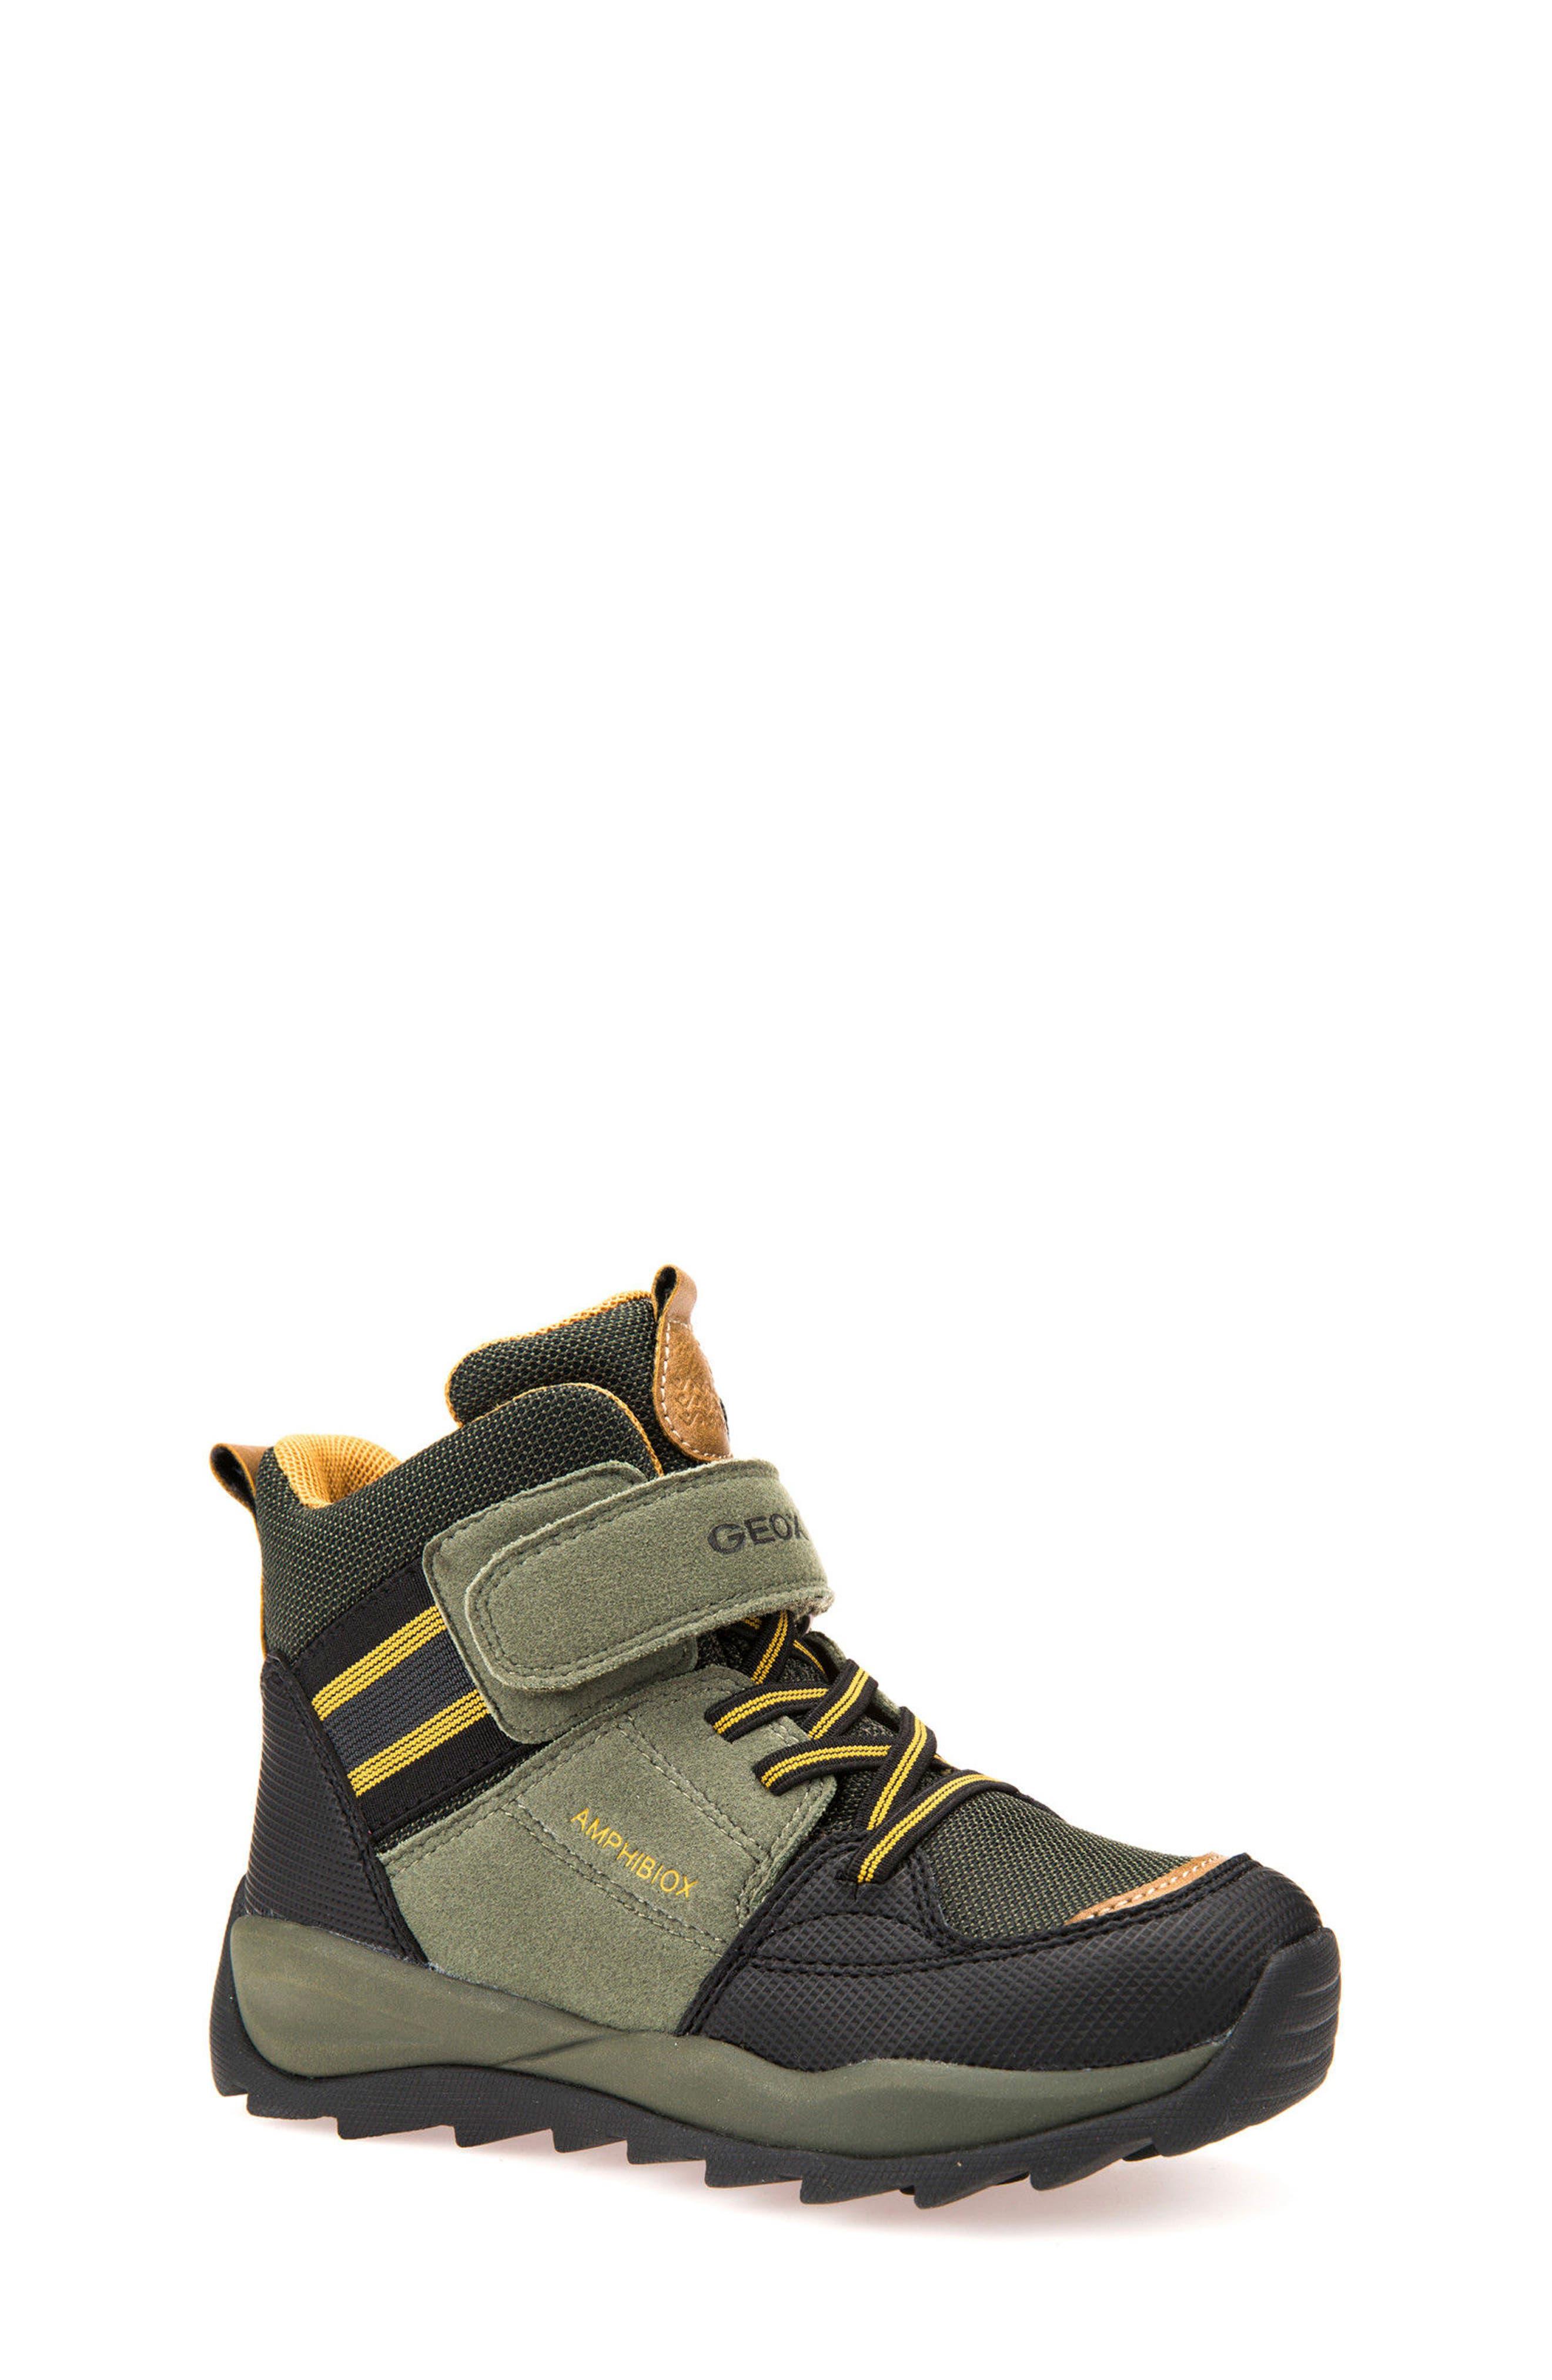 Main Image - Geox Orizont ABX Waterproof Boot (Toddler, Little Kid & Big Kid)